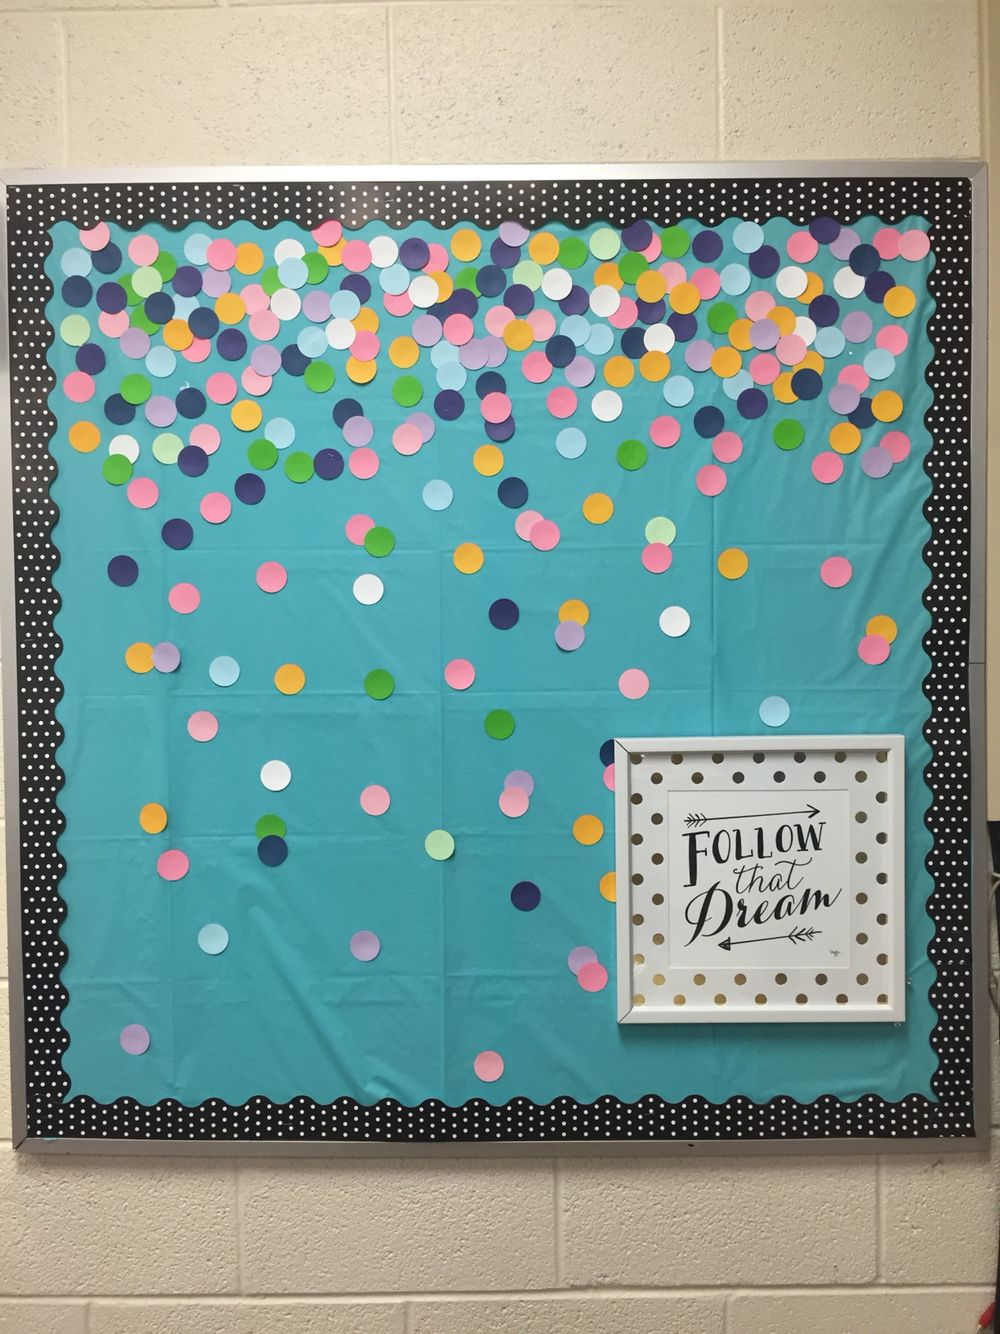 Confetti bulletin board education highschool  In the